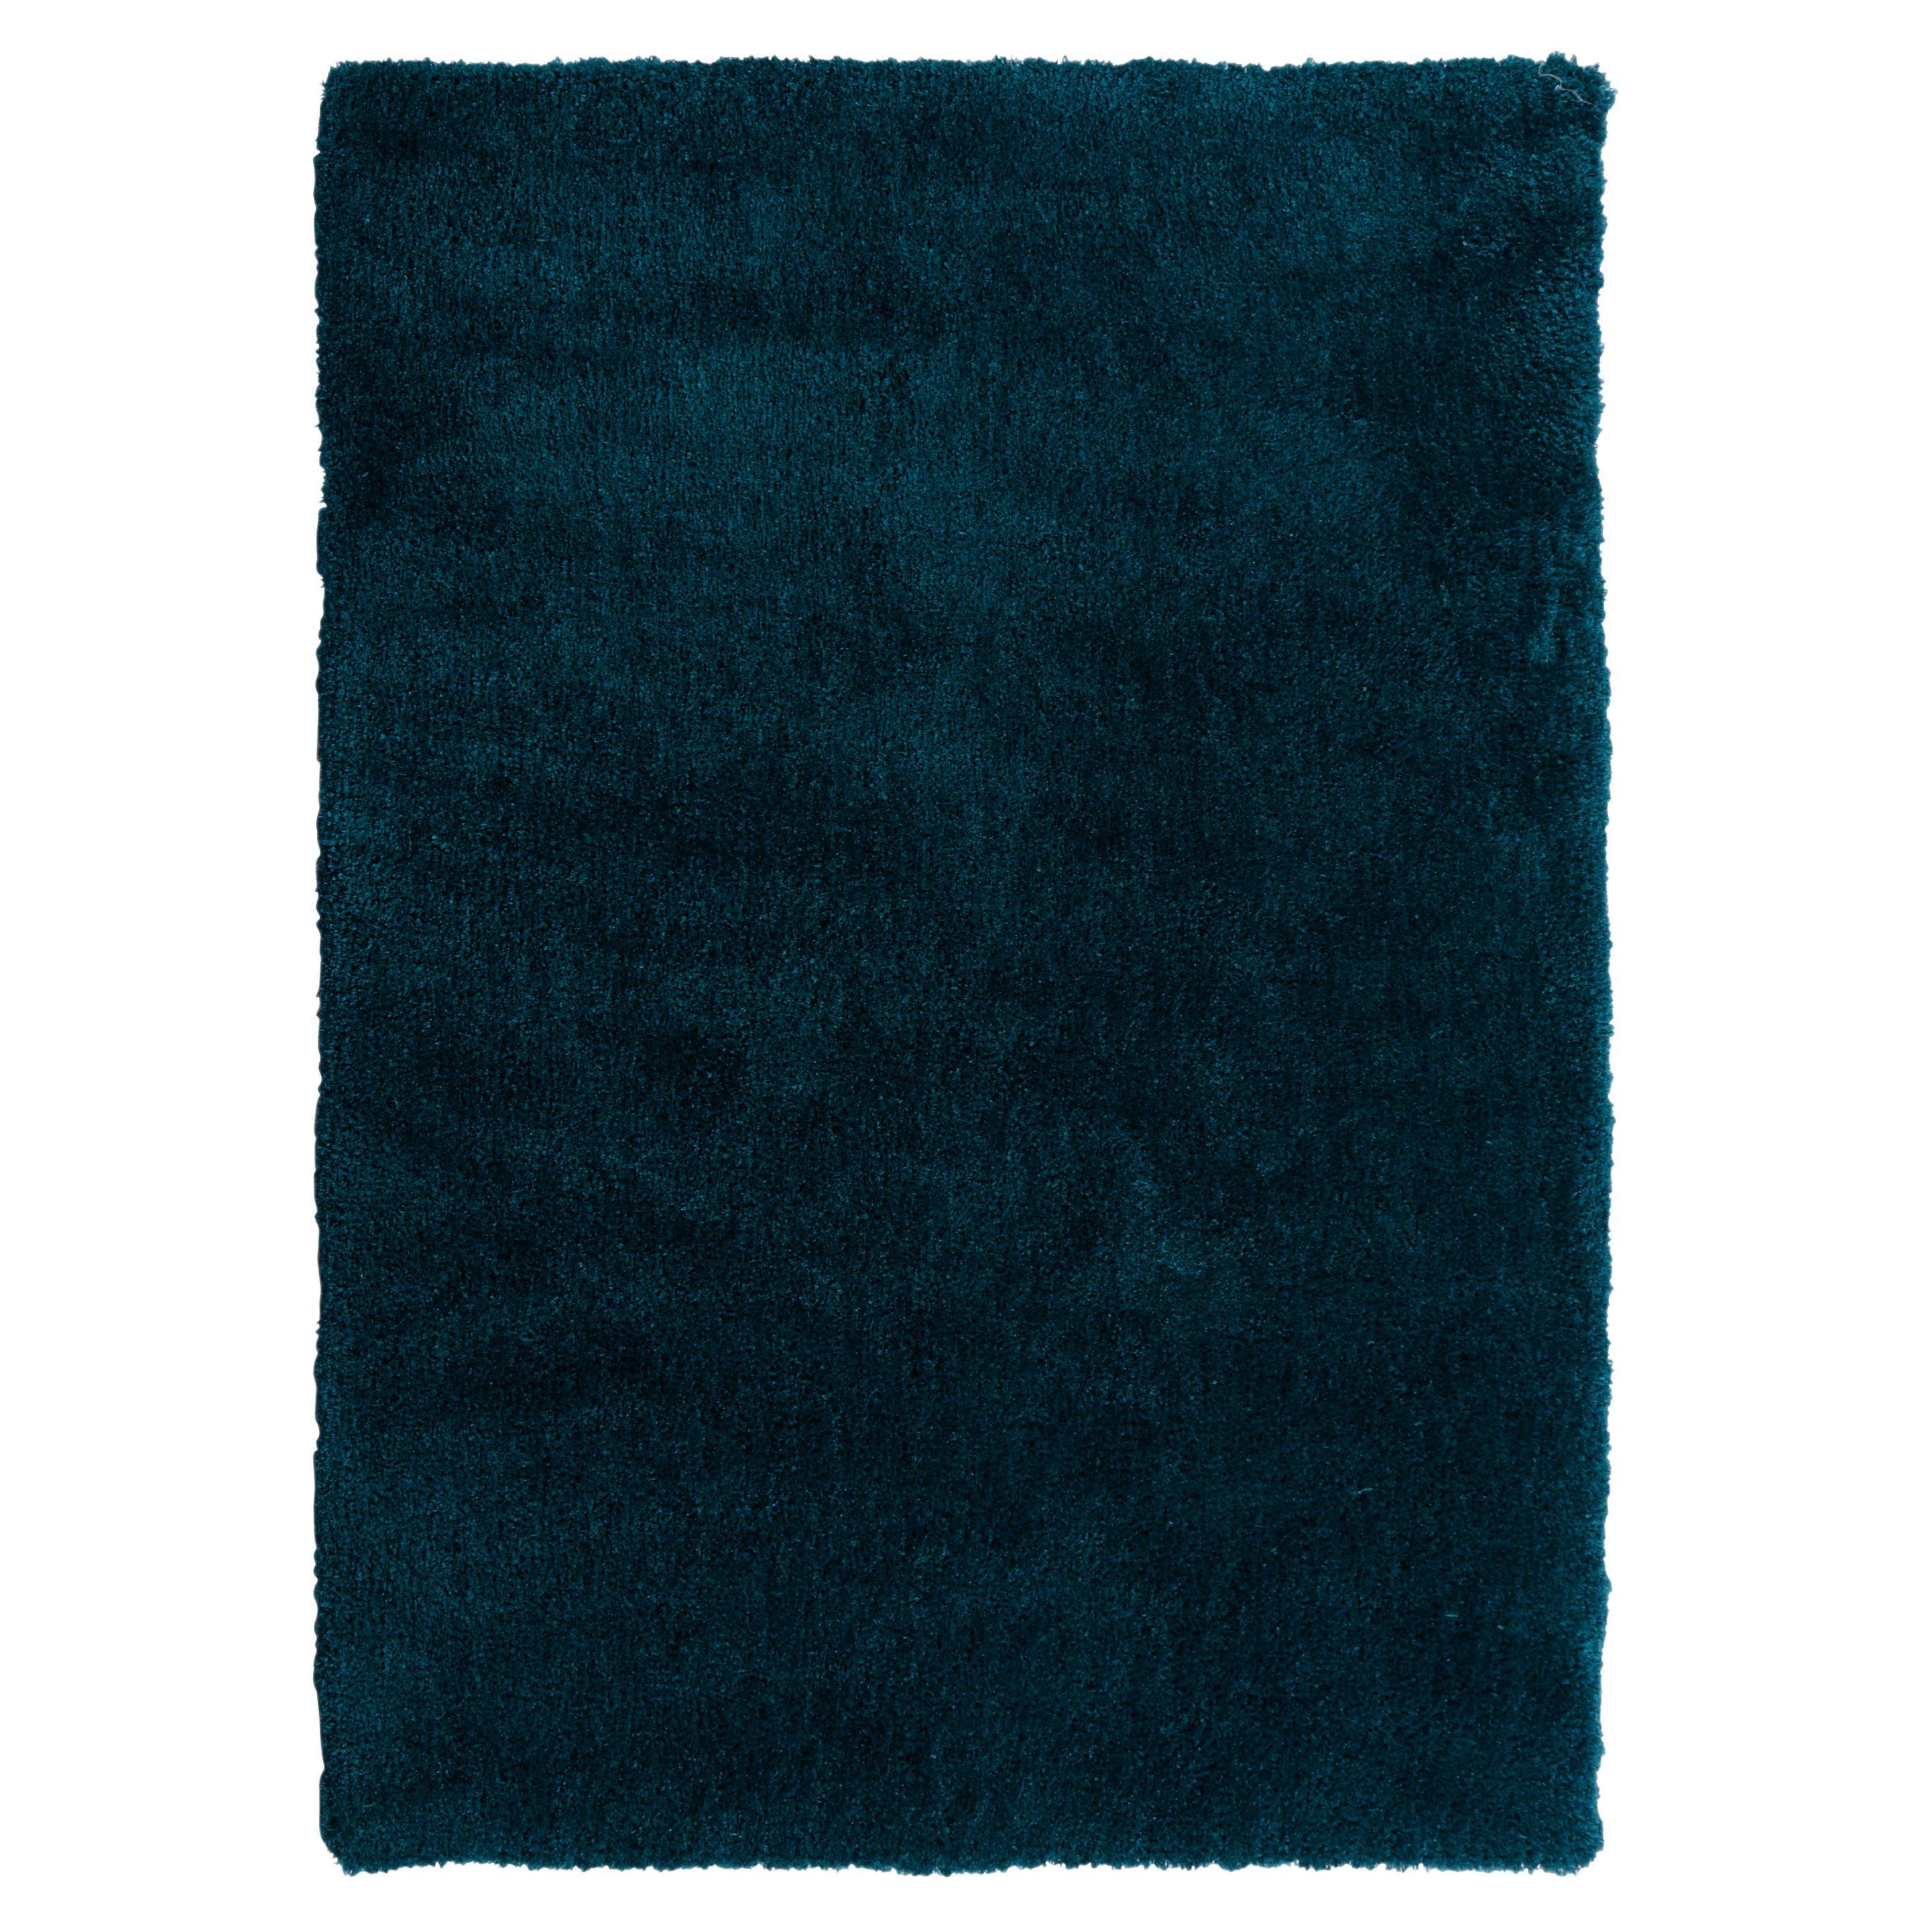 contour mat rugs foam large soft lifewit itm sets white rug memory mats peacock set lid carpet toilet bath bathroom cover